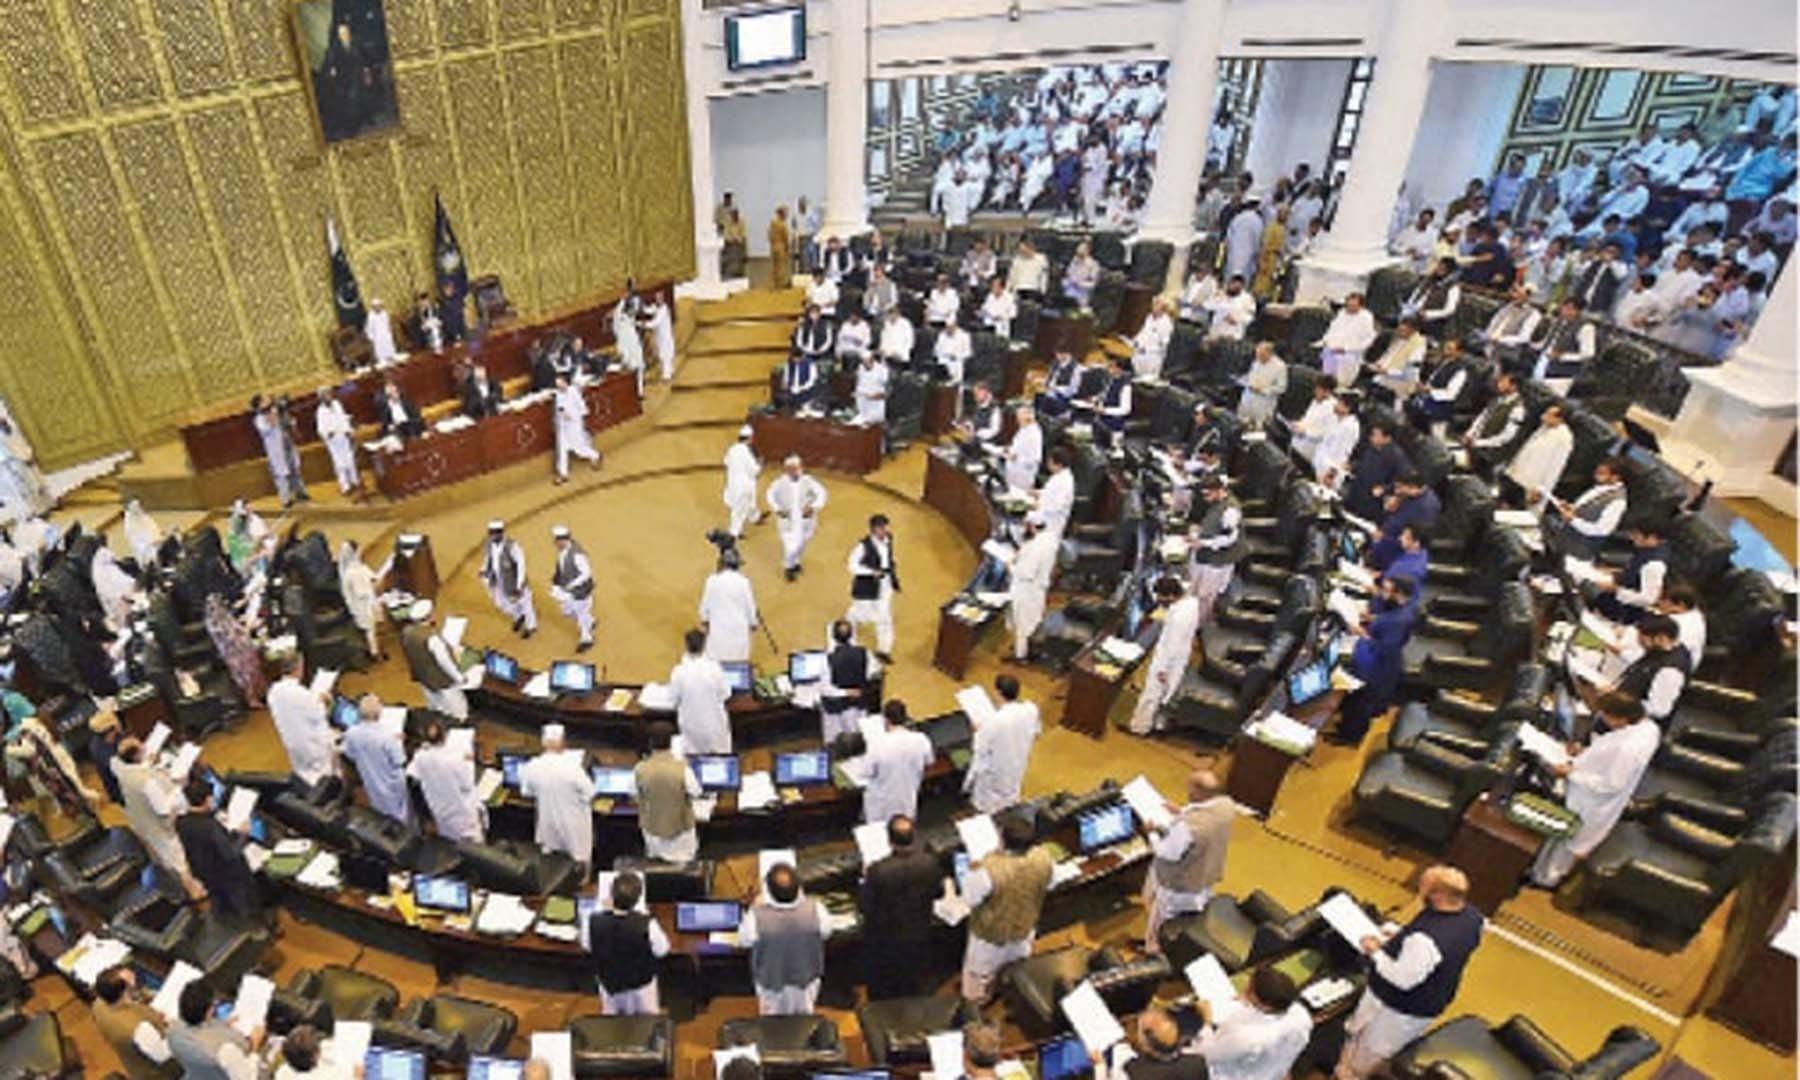 This file photo shows a session of the Khyber Pakhtunkhwa Assembly. — Photo courtesy Abdul Majeed Goraya/File